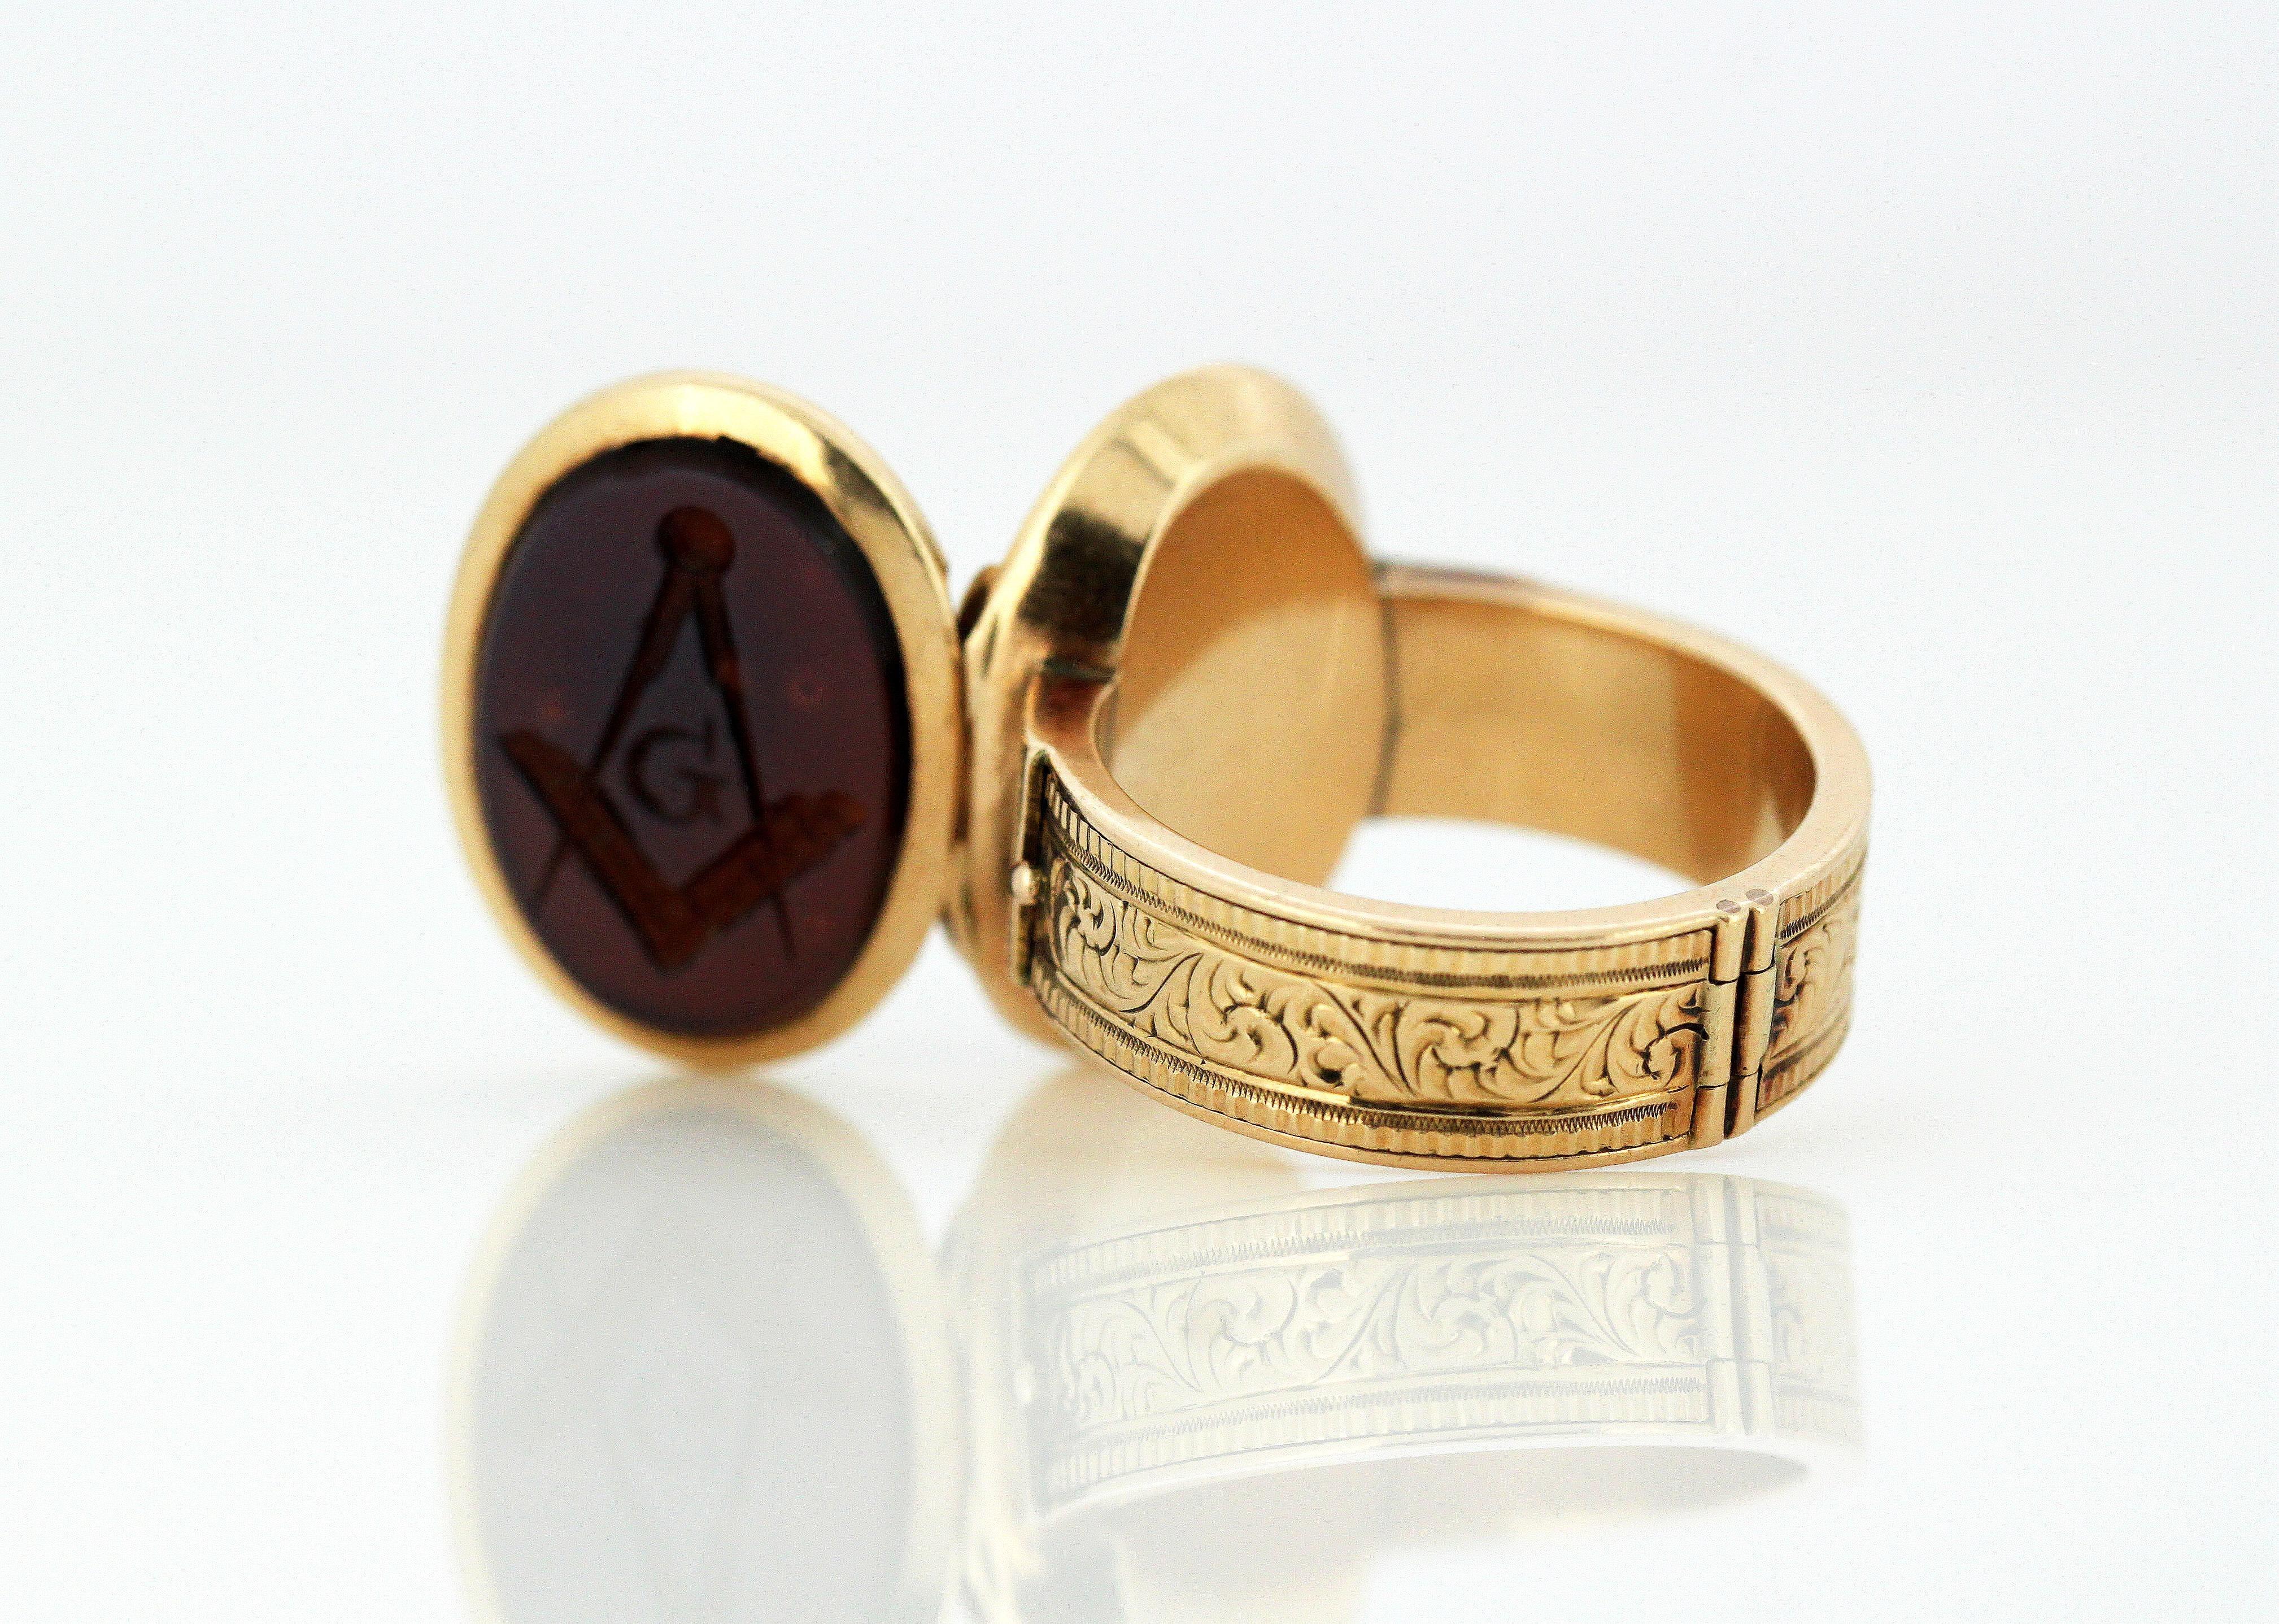 Antique Victorian 15 Karat Gold Masonic Locket / Mourning Ring, circa 1860s